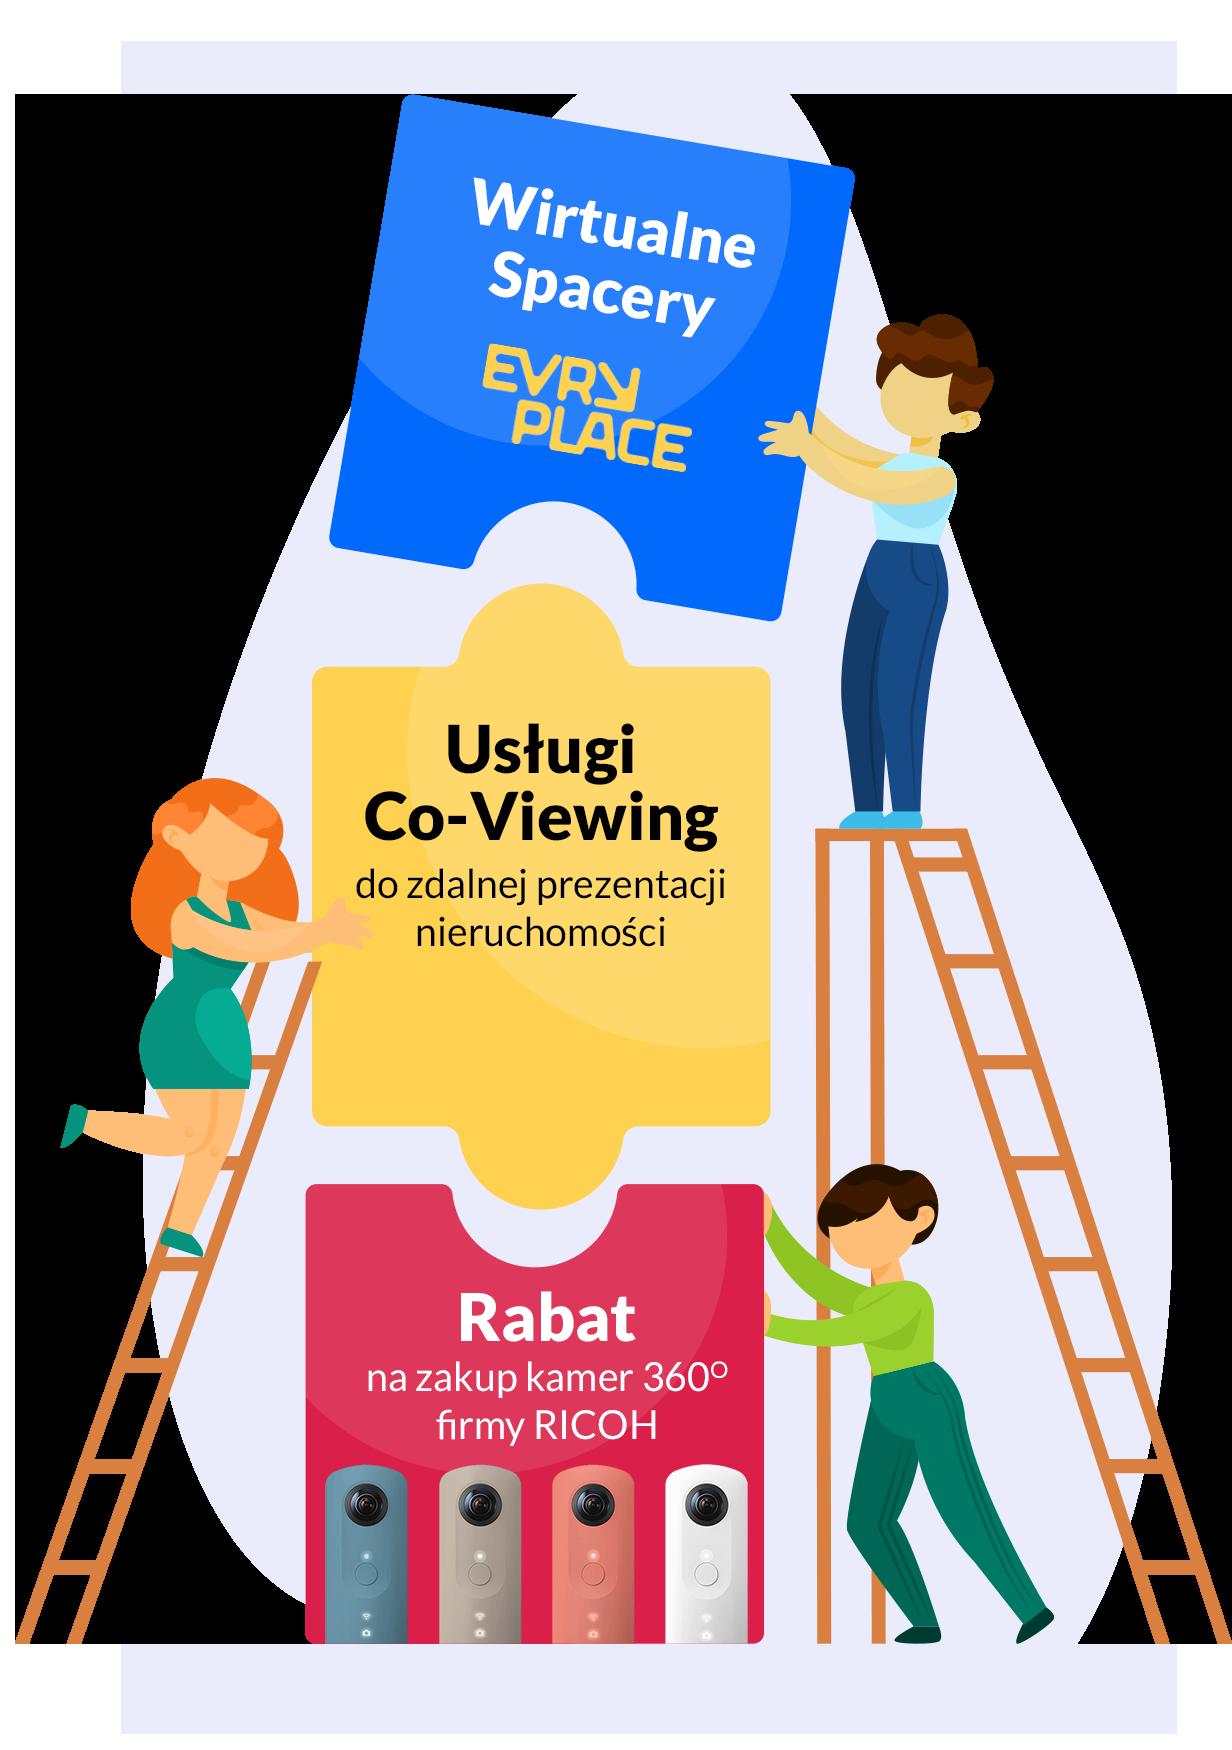 Wirtualne spacery i Co-Viewing w ASARI CRM